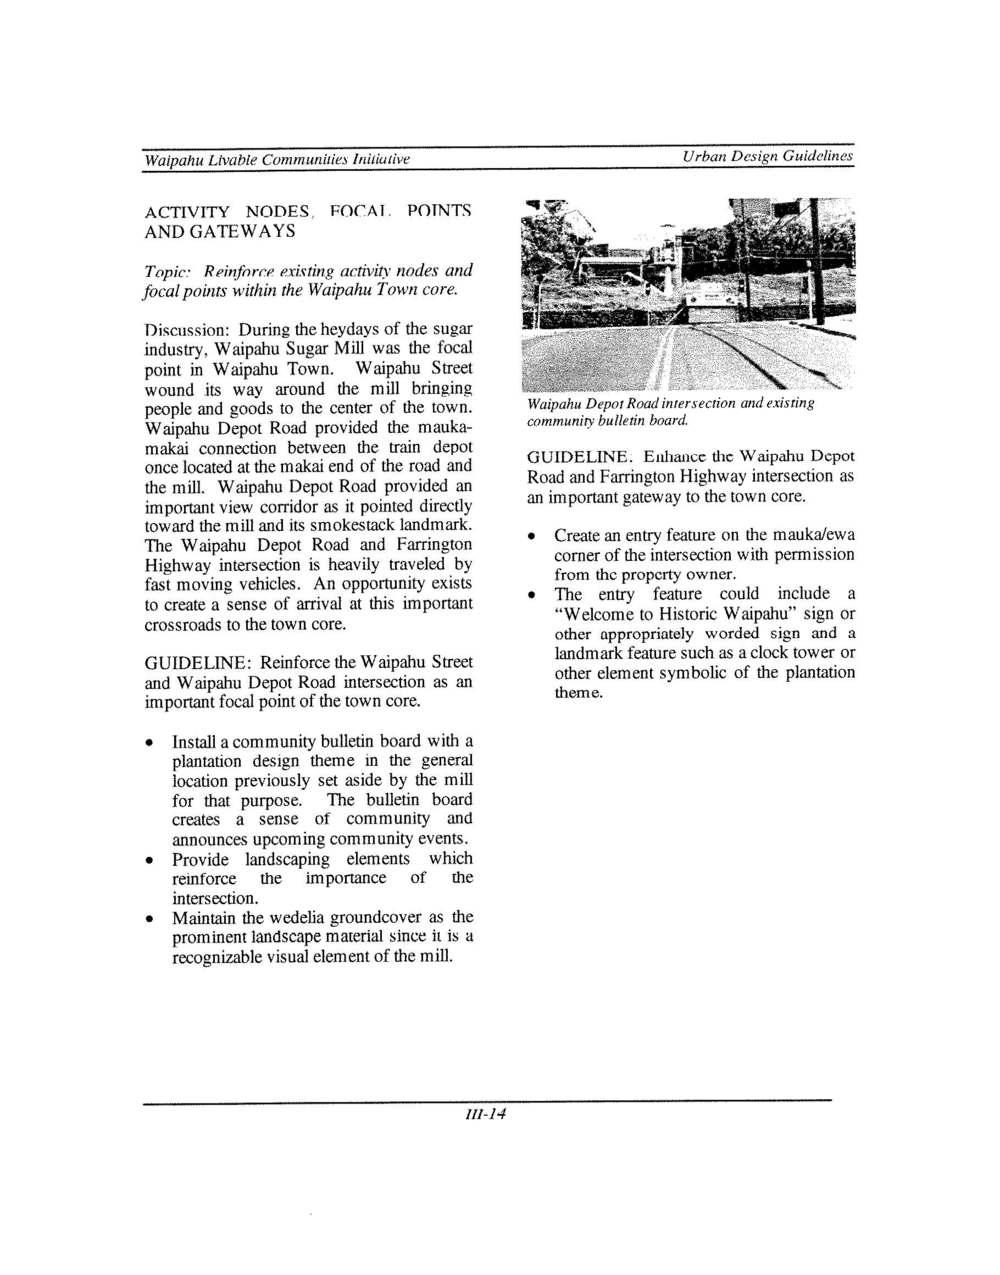 160531_WaipahuLivableCommunities(1998)_Page_104.jpg